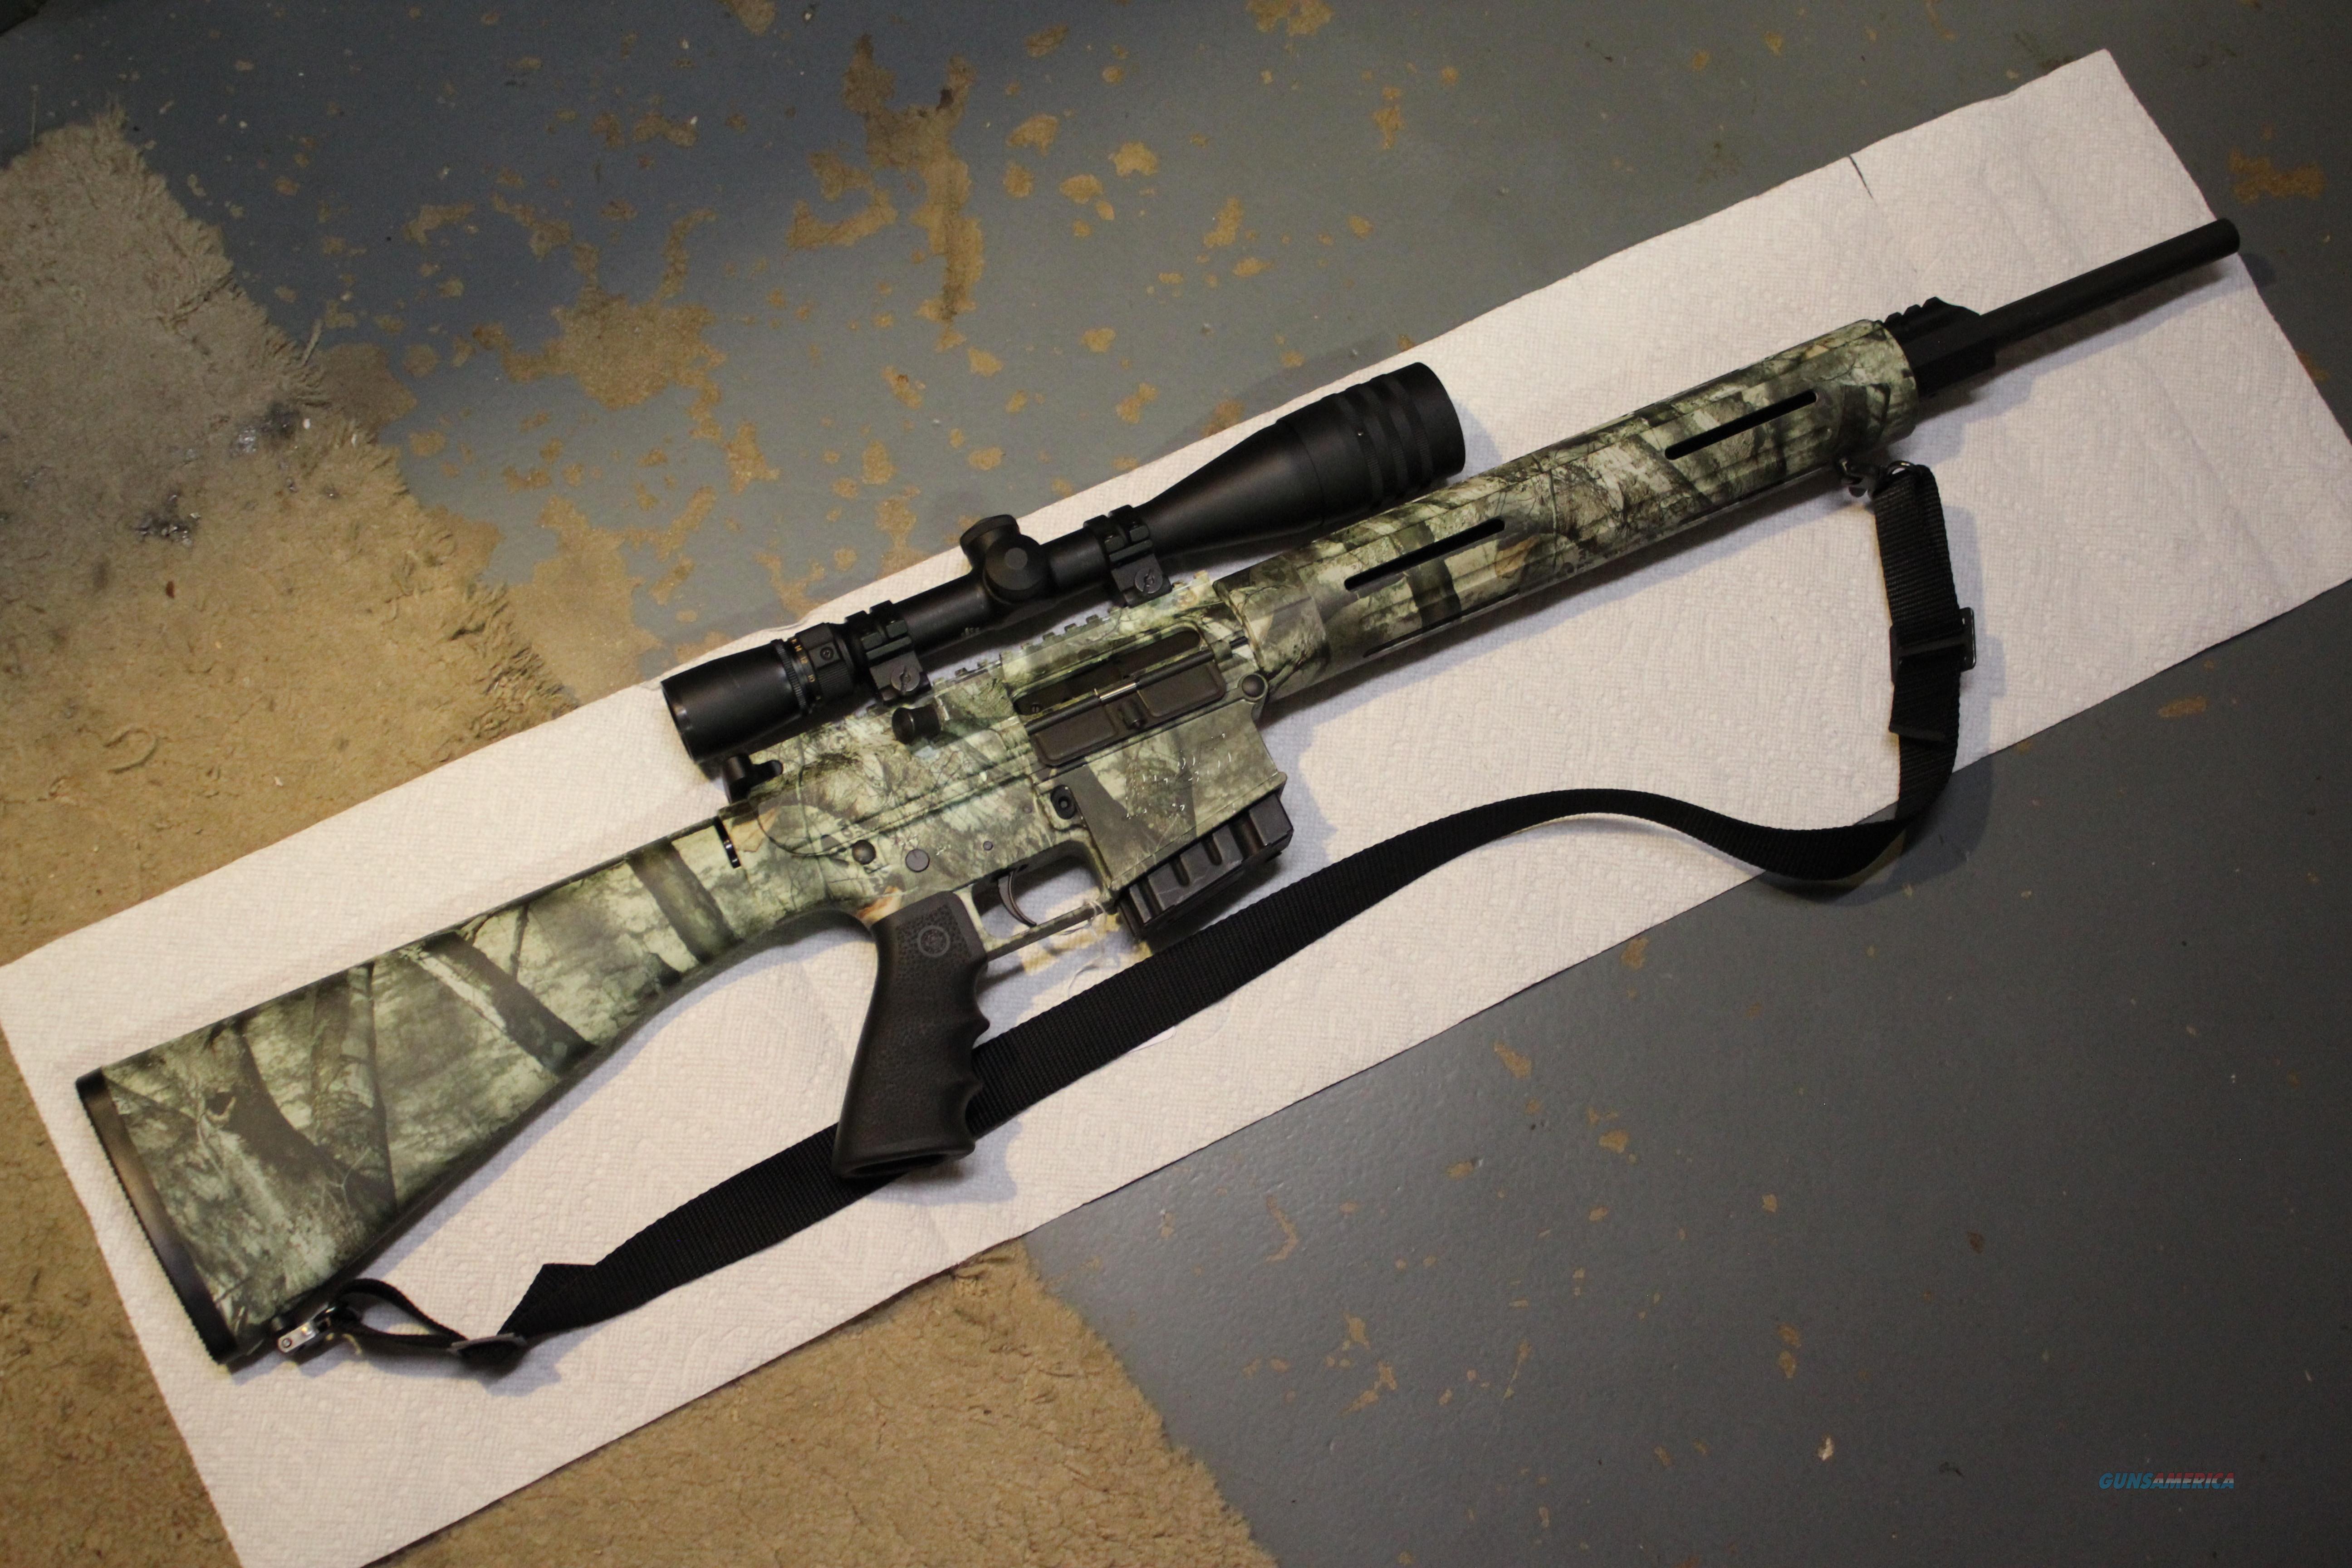 REMINGTON R25   Guns > Rifles > Remington Rifles - Modern > AR-15 Platform